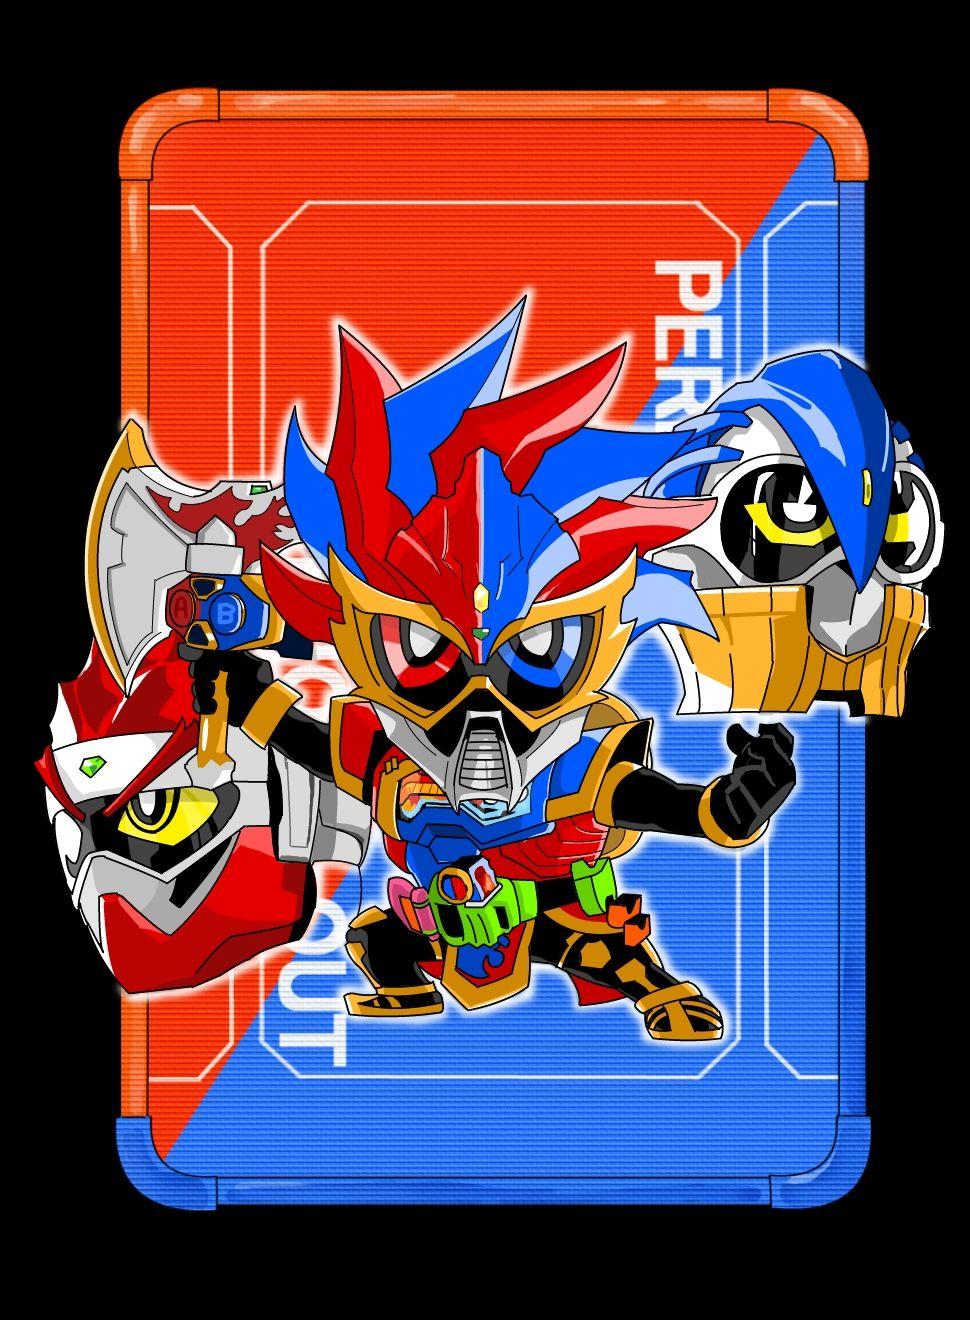 Pin oleh Captain Marvelous di Kamen Rider ExAid 仮面ライダー